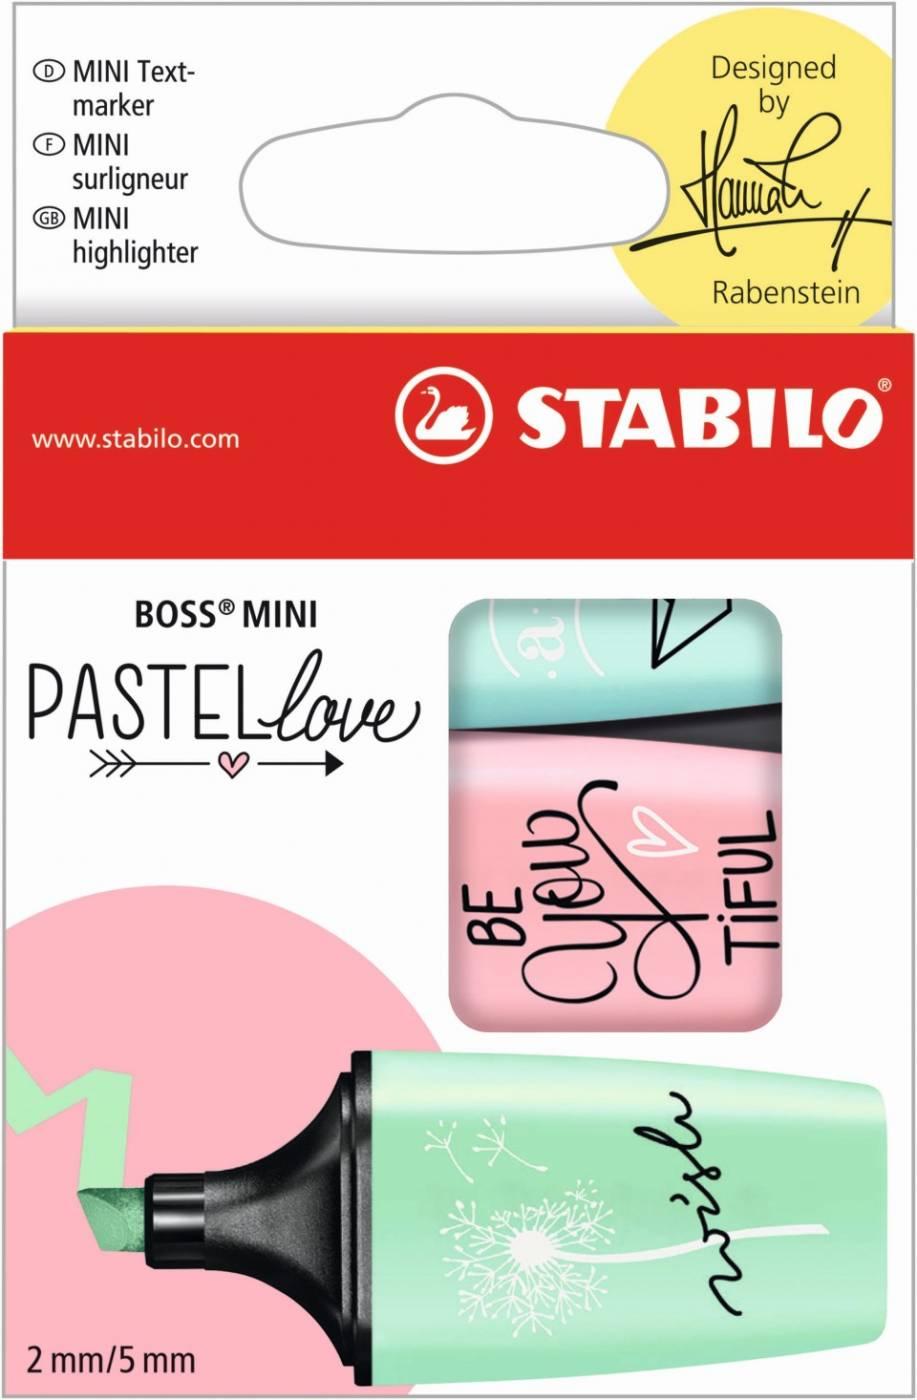 Pastel Love Mini Stabilo - Kit 3 Un Marca Texto - Laranja Lilás e Verde